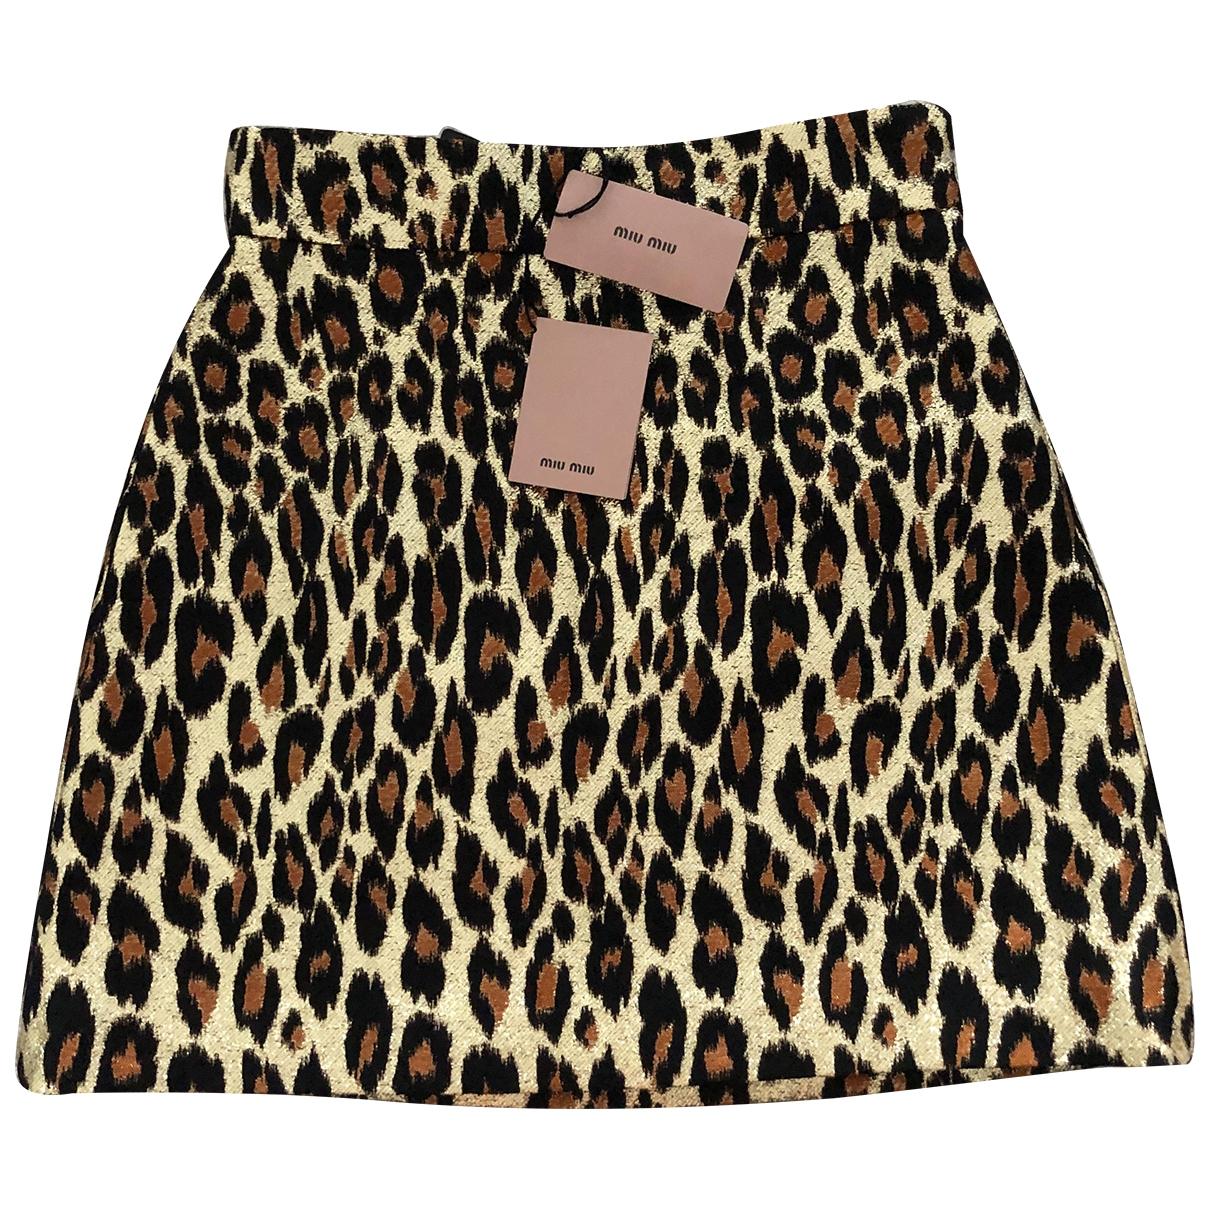 Miu Miu \N Metallic skirt for Women 40 IT